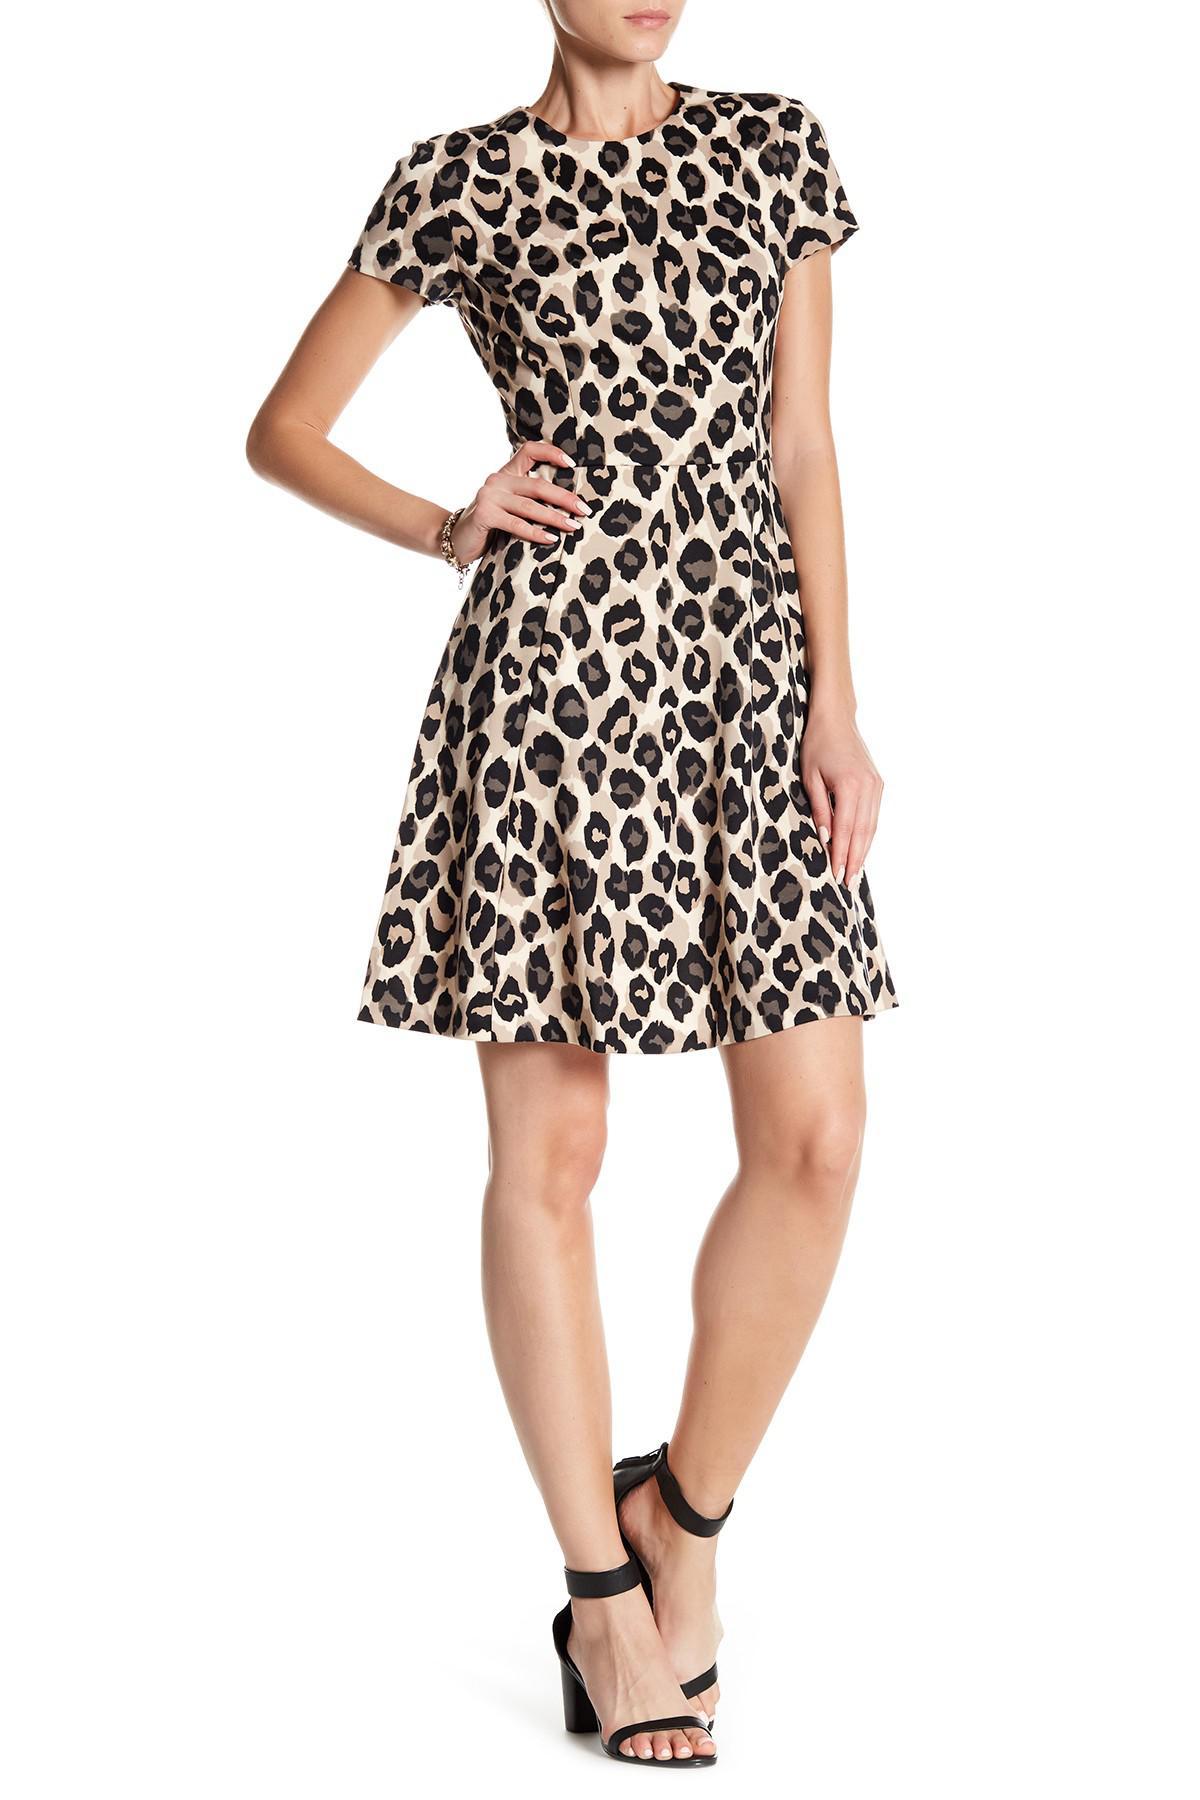 Lyst Eliza J Petite Animal Print Short Sleeve Dress In Black